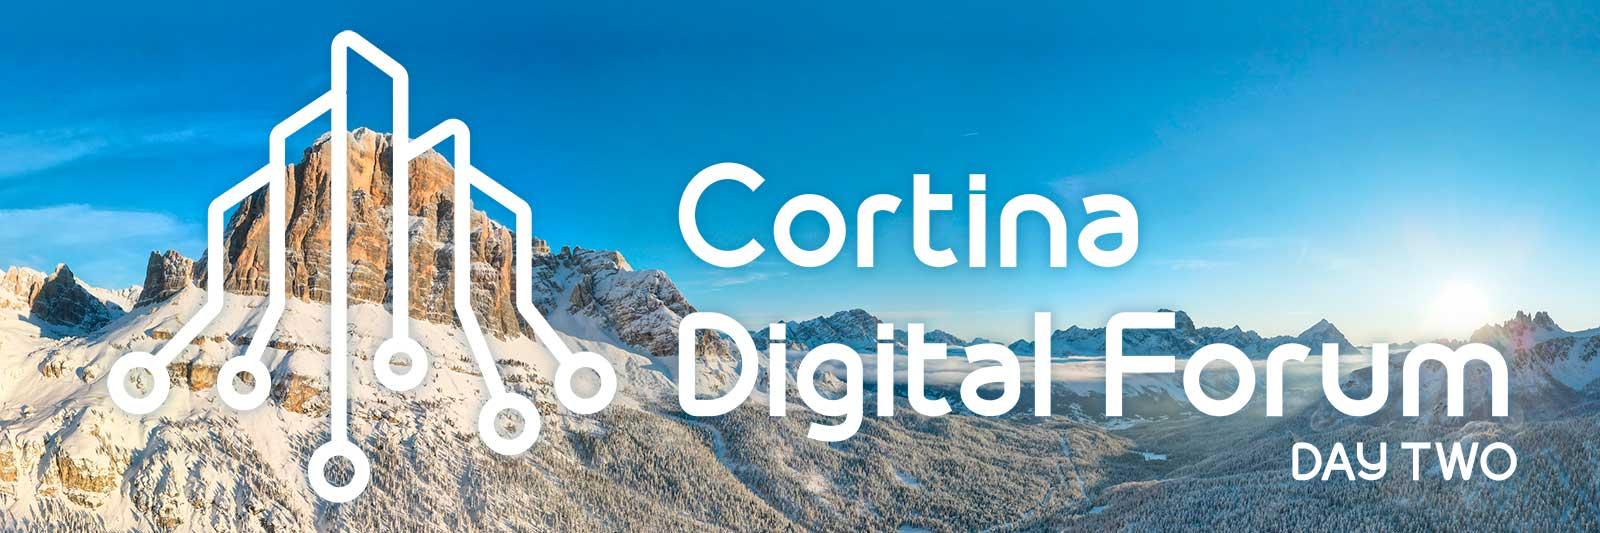 Cortina Digital Forum 2021 - day two